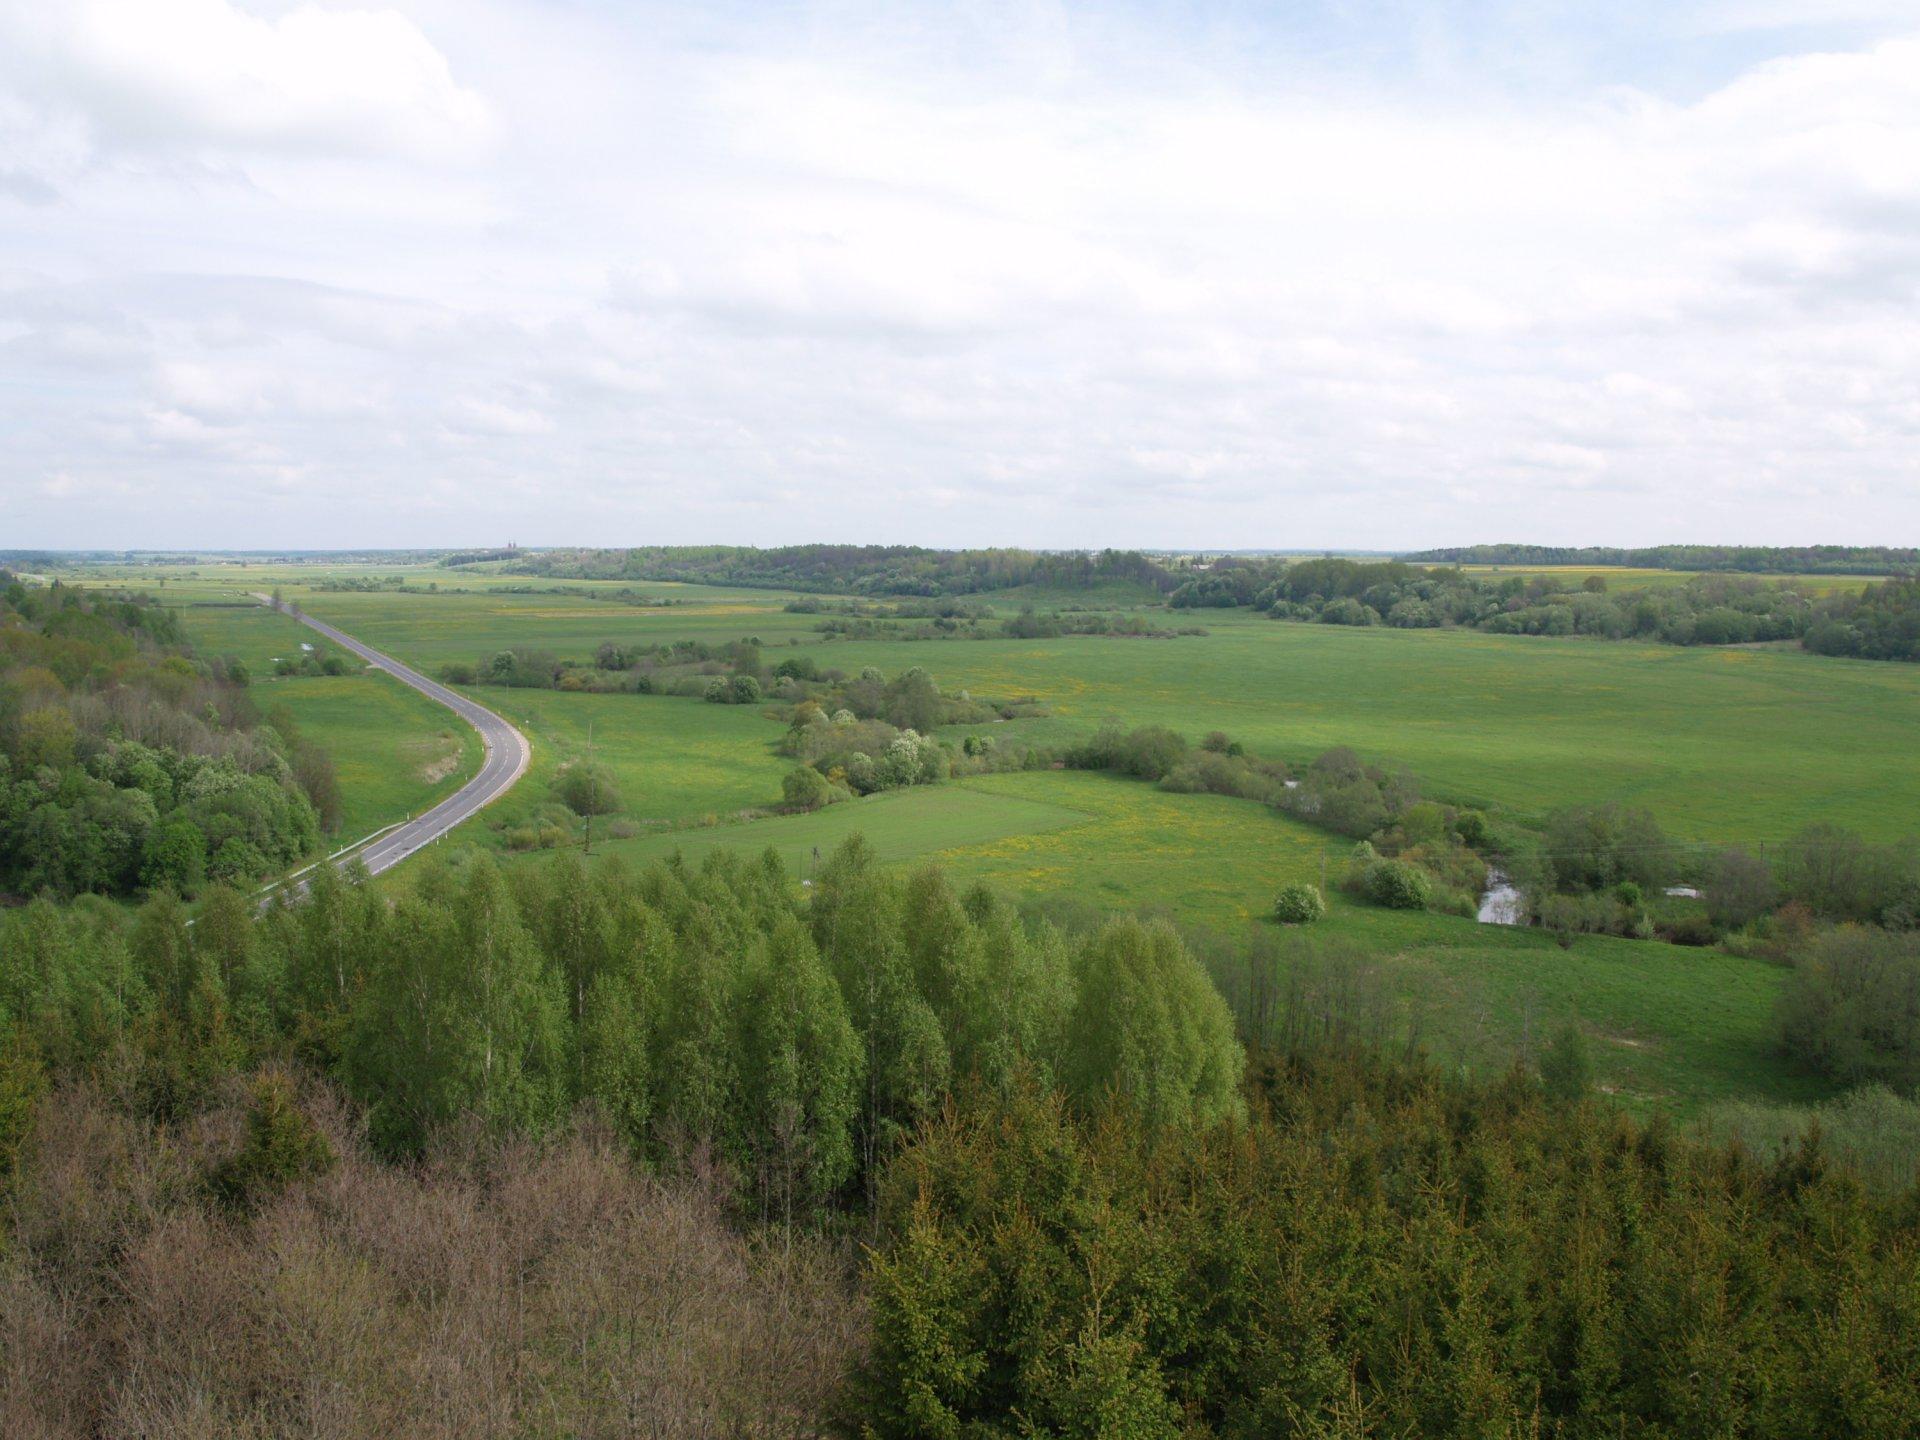 Kartenos Piliakalnis Salantu Regioninis Parkas.Lietuviskoji Tundra Salantų Regioniniame Parke